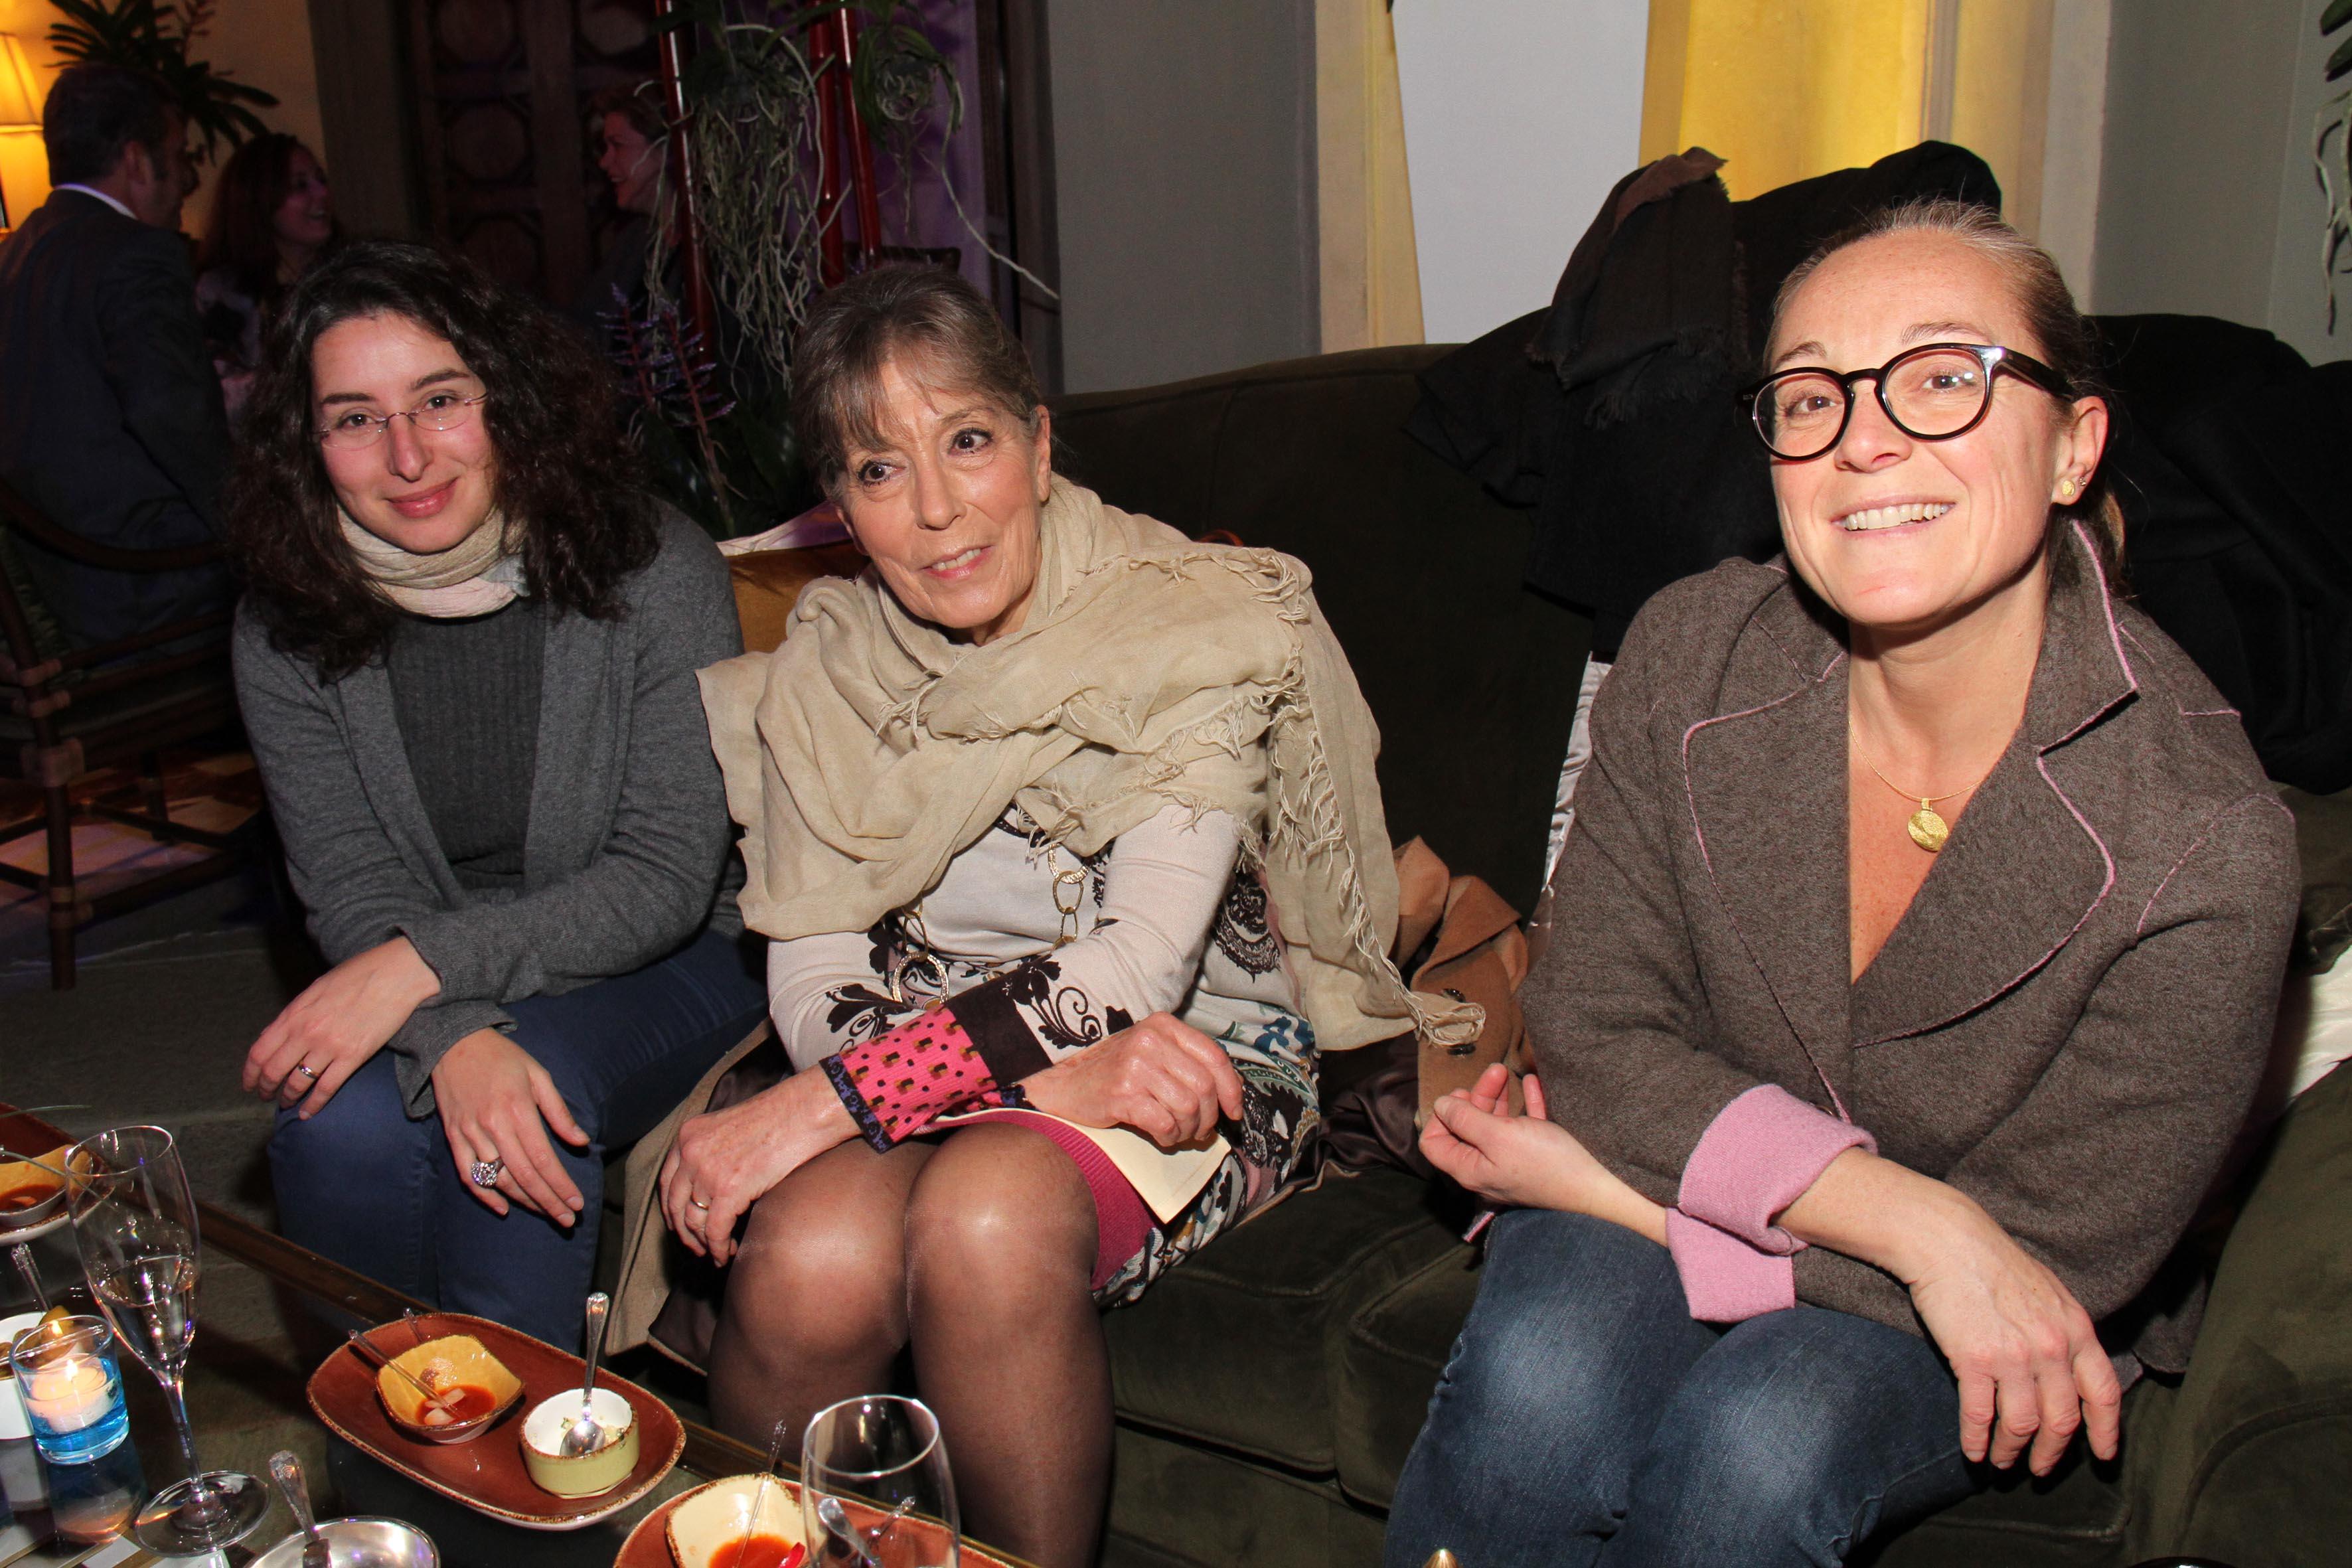 PRESSPHOTO Firenze,  Four Seasons, evento Metropolitan. Nella foto Nicoletta Conti, Franca Morini e Elisa Biagi  foto Giuseppe Cabras/New Press Photo